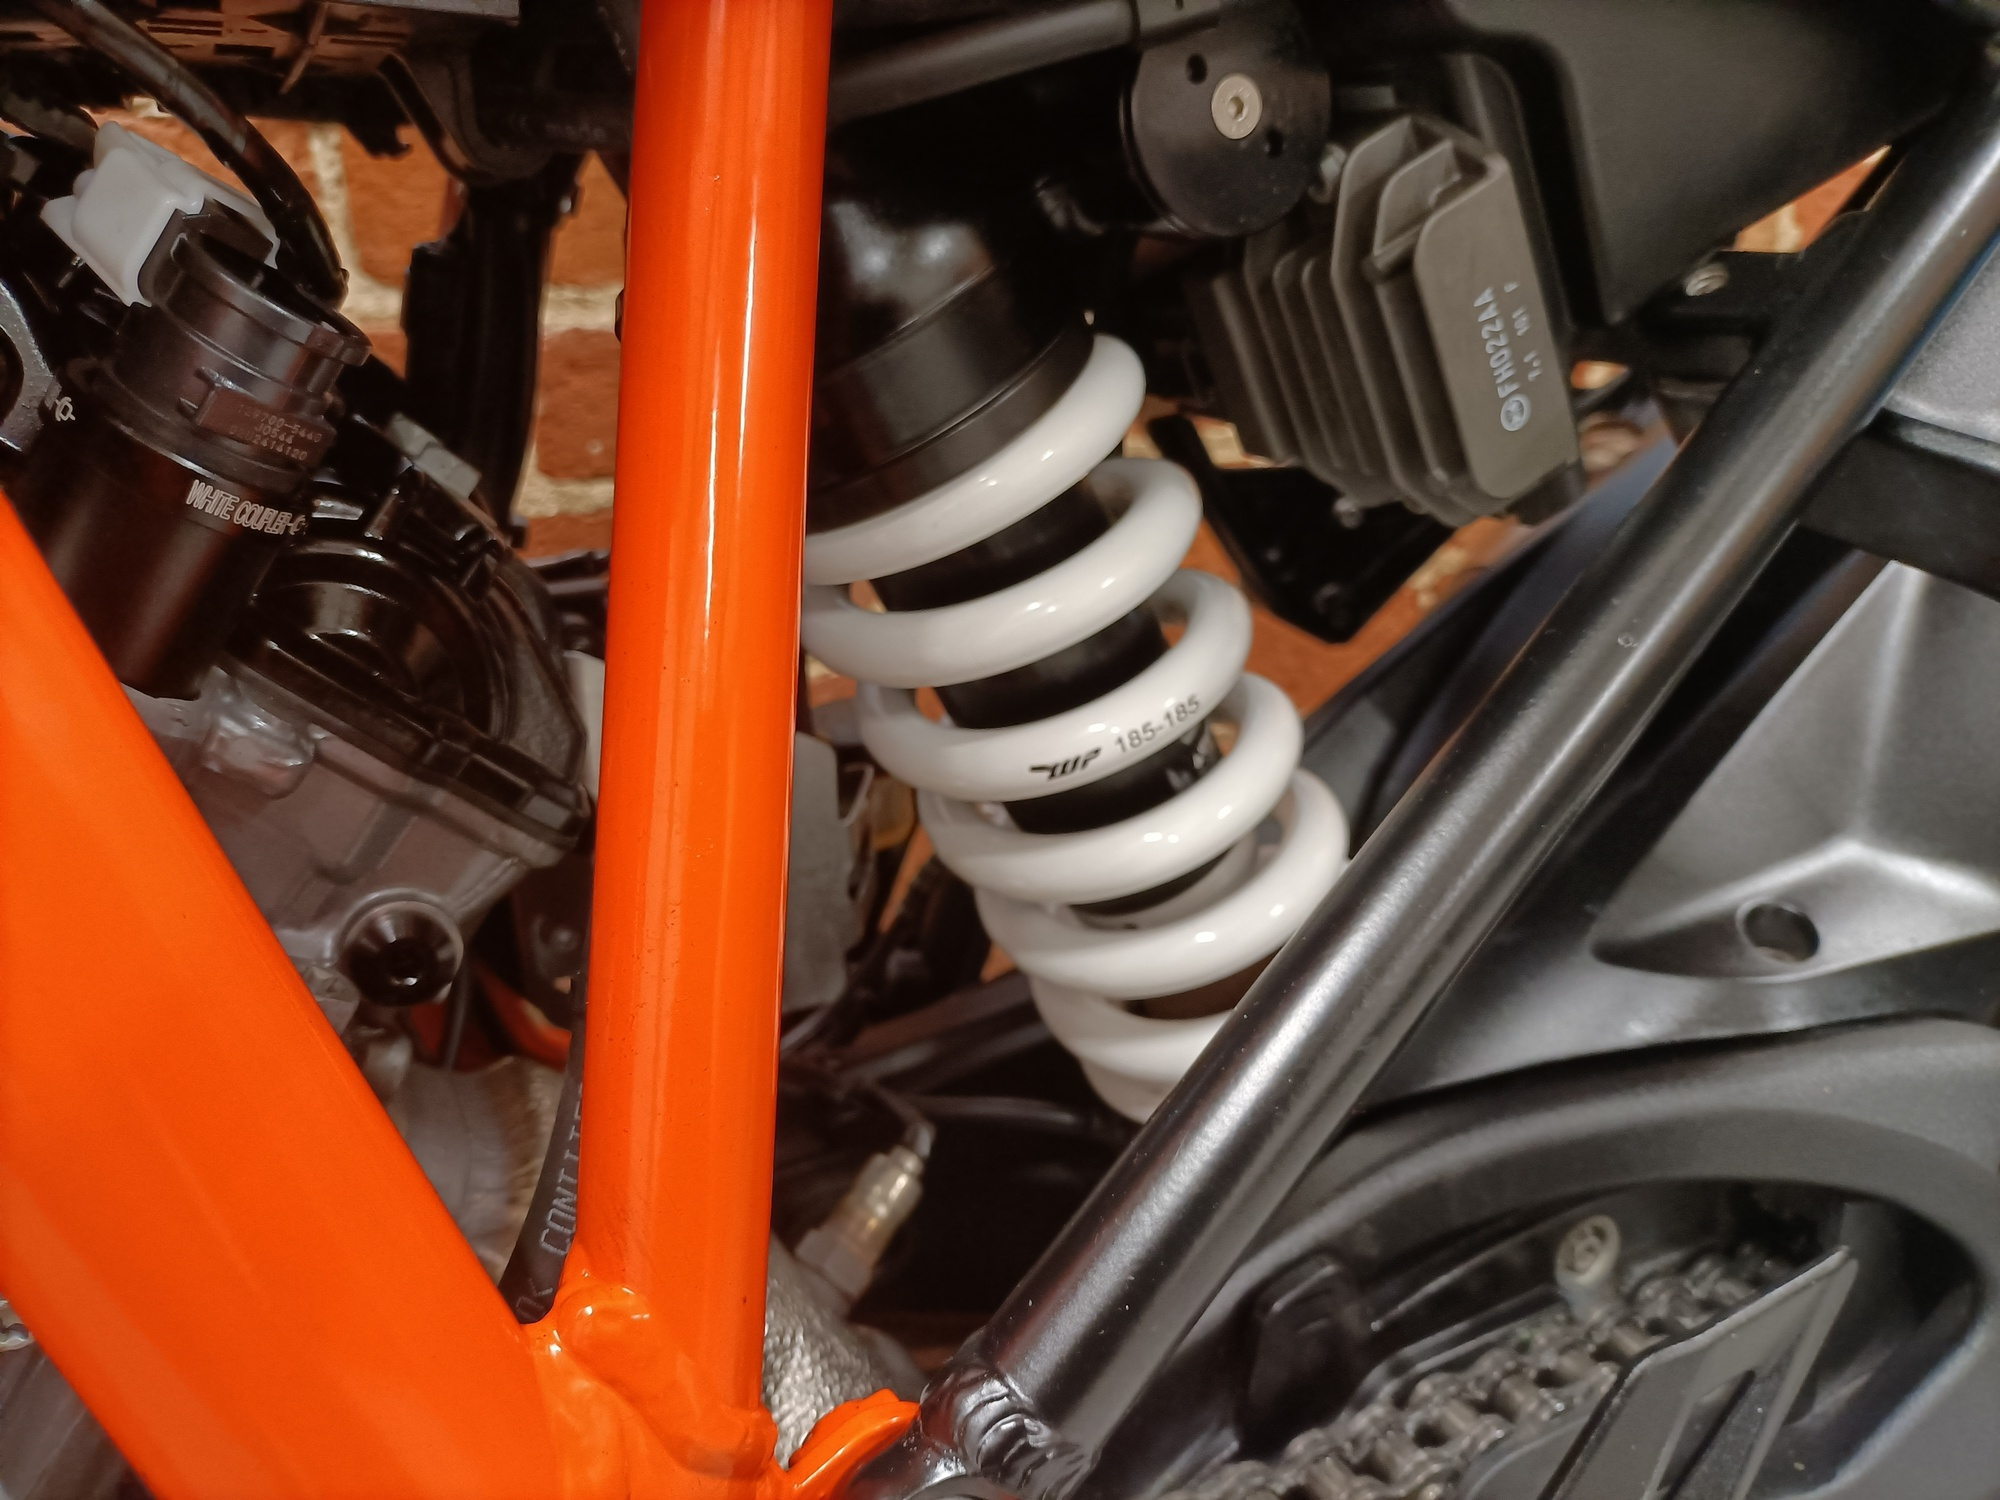 2017 KTM 1290 SUPERDUKE GT FULL KTM HISTORY POWER PARTS